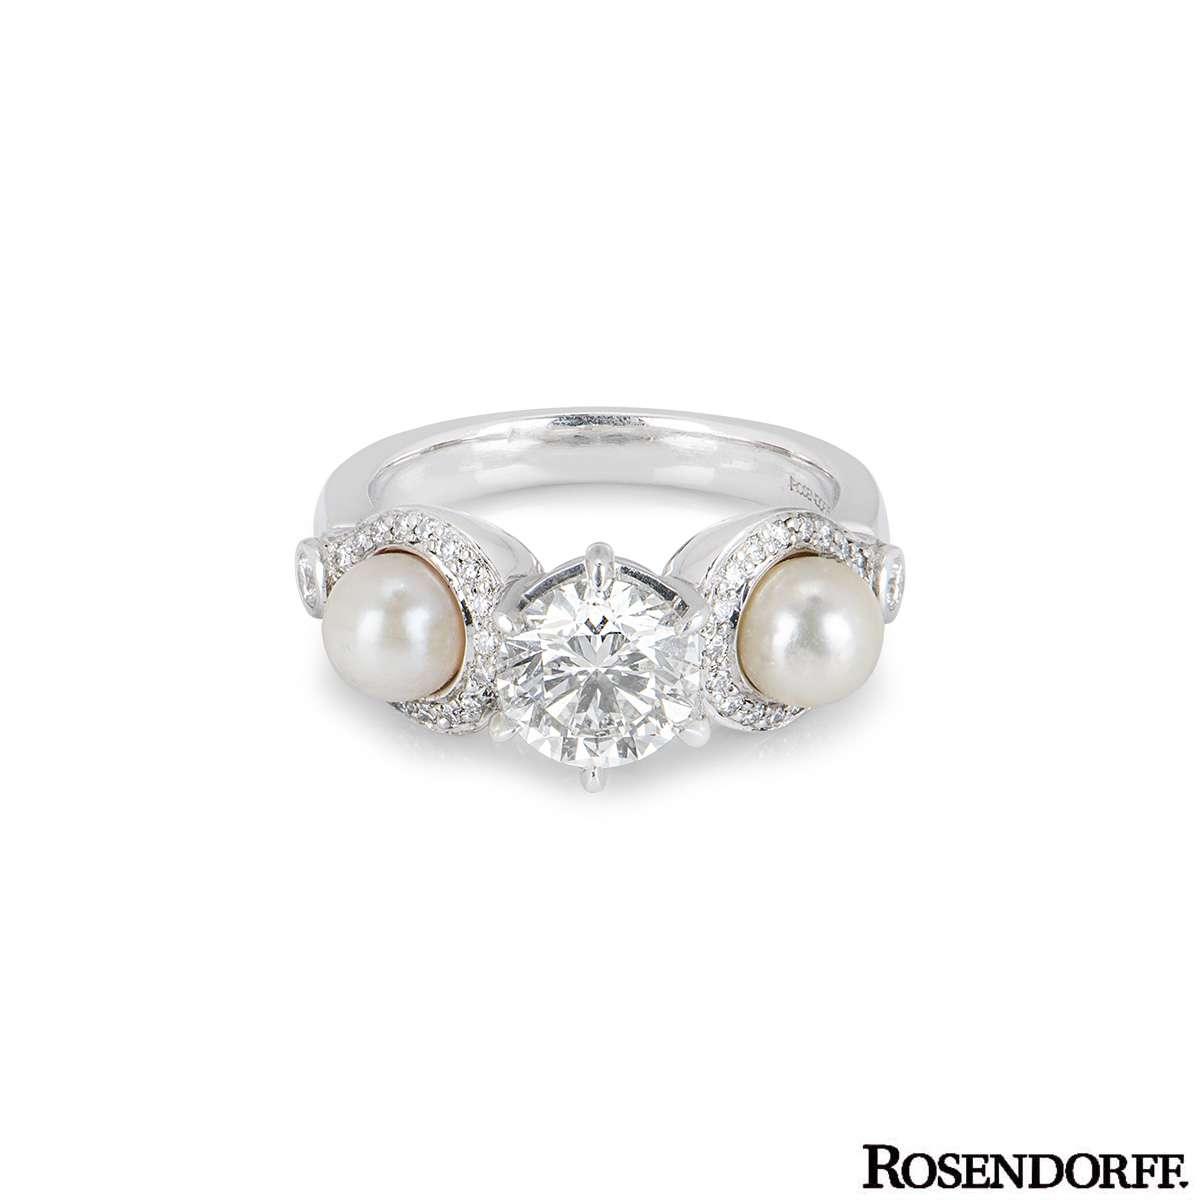 Rosendorff White Gold Diamond & Pearl Ring 1.20ct J/SI1